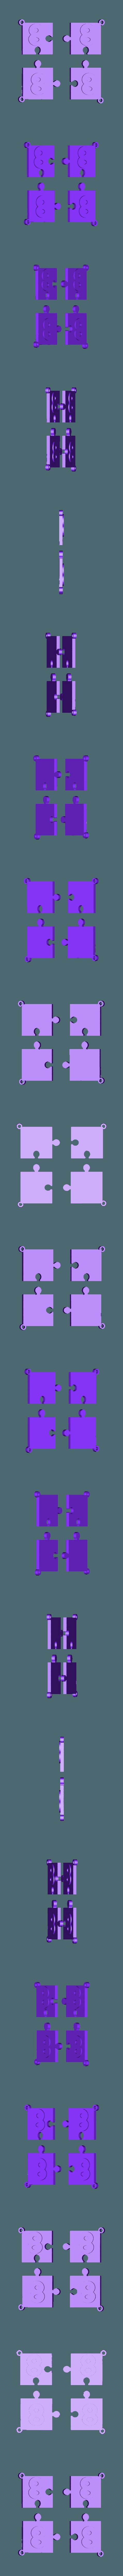 puzzle 8.stl Download STL file puzzle key ring • 3D printing design, catf3d